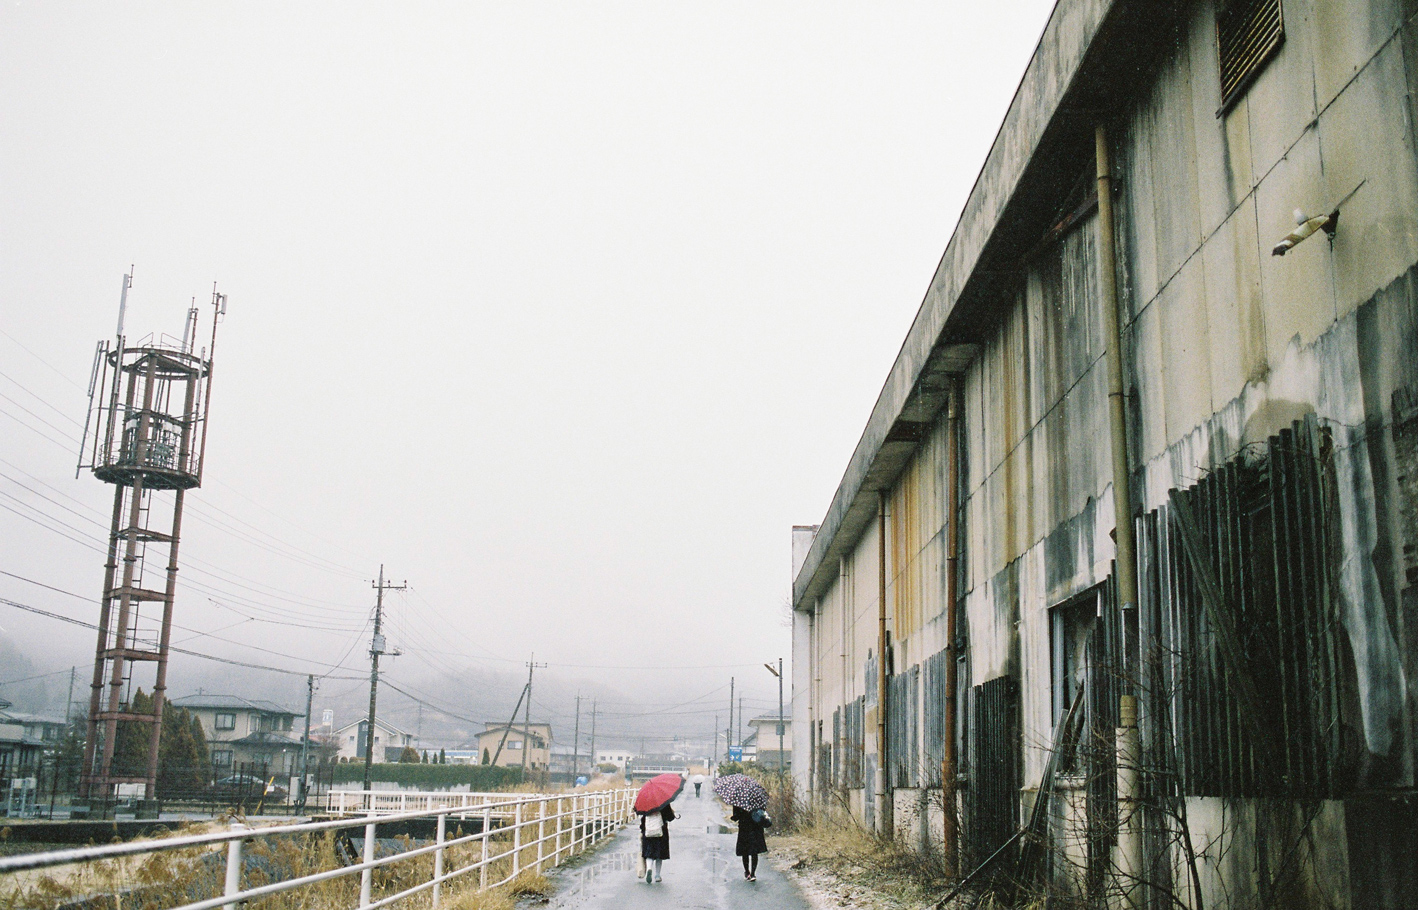 013-kawaguchiko-mount-fuji-japan-sophie-baker-photography